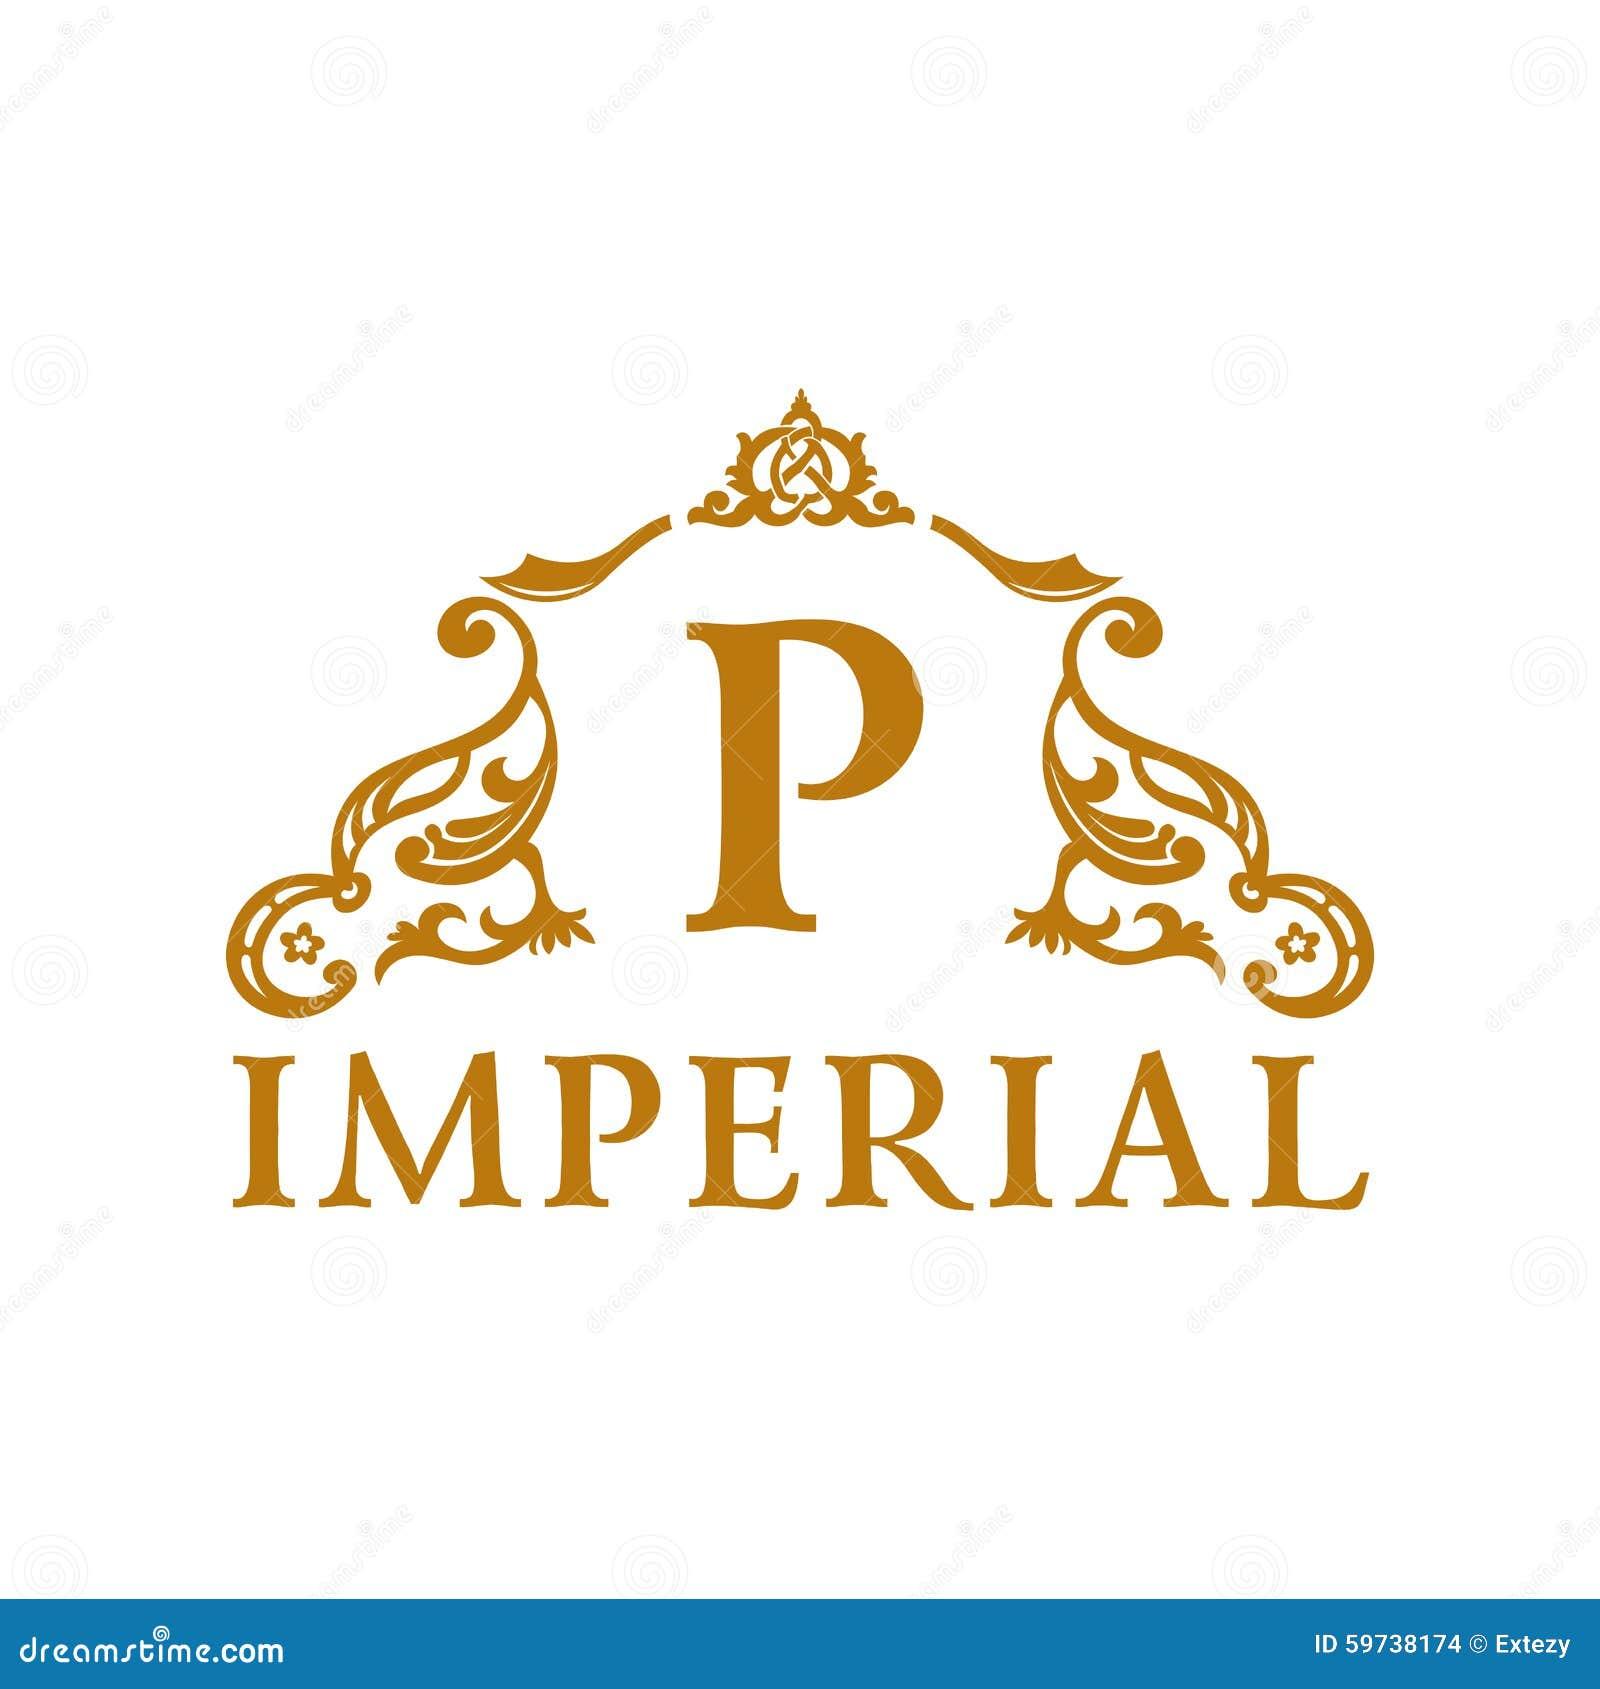 Calligraphic vintage emblem gold decor luxury stock for Decoration logo